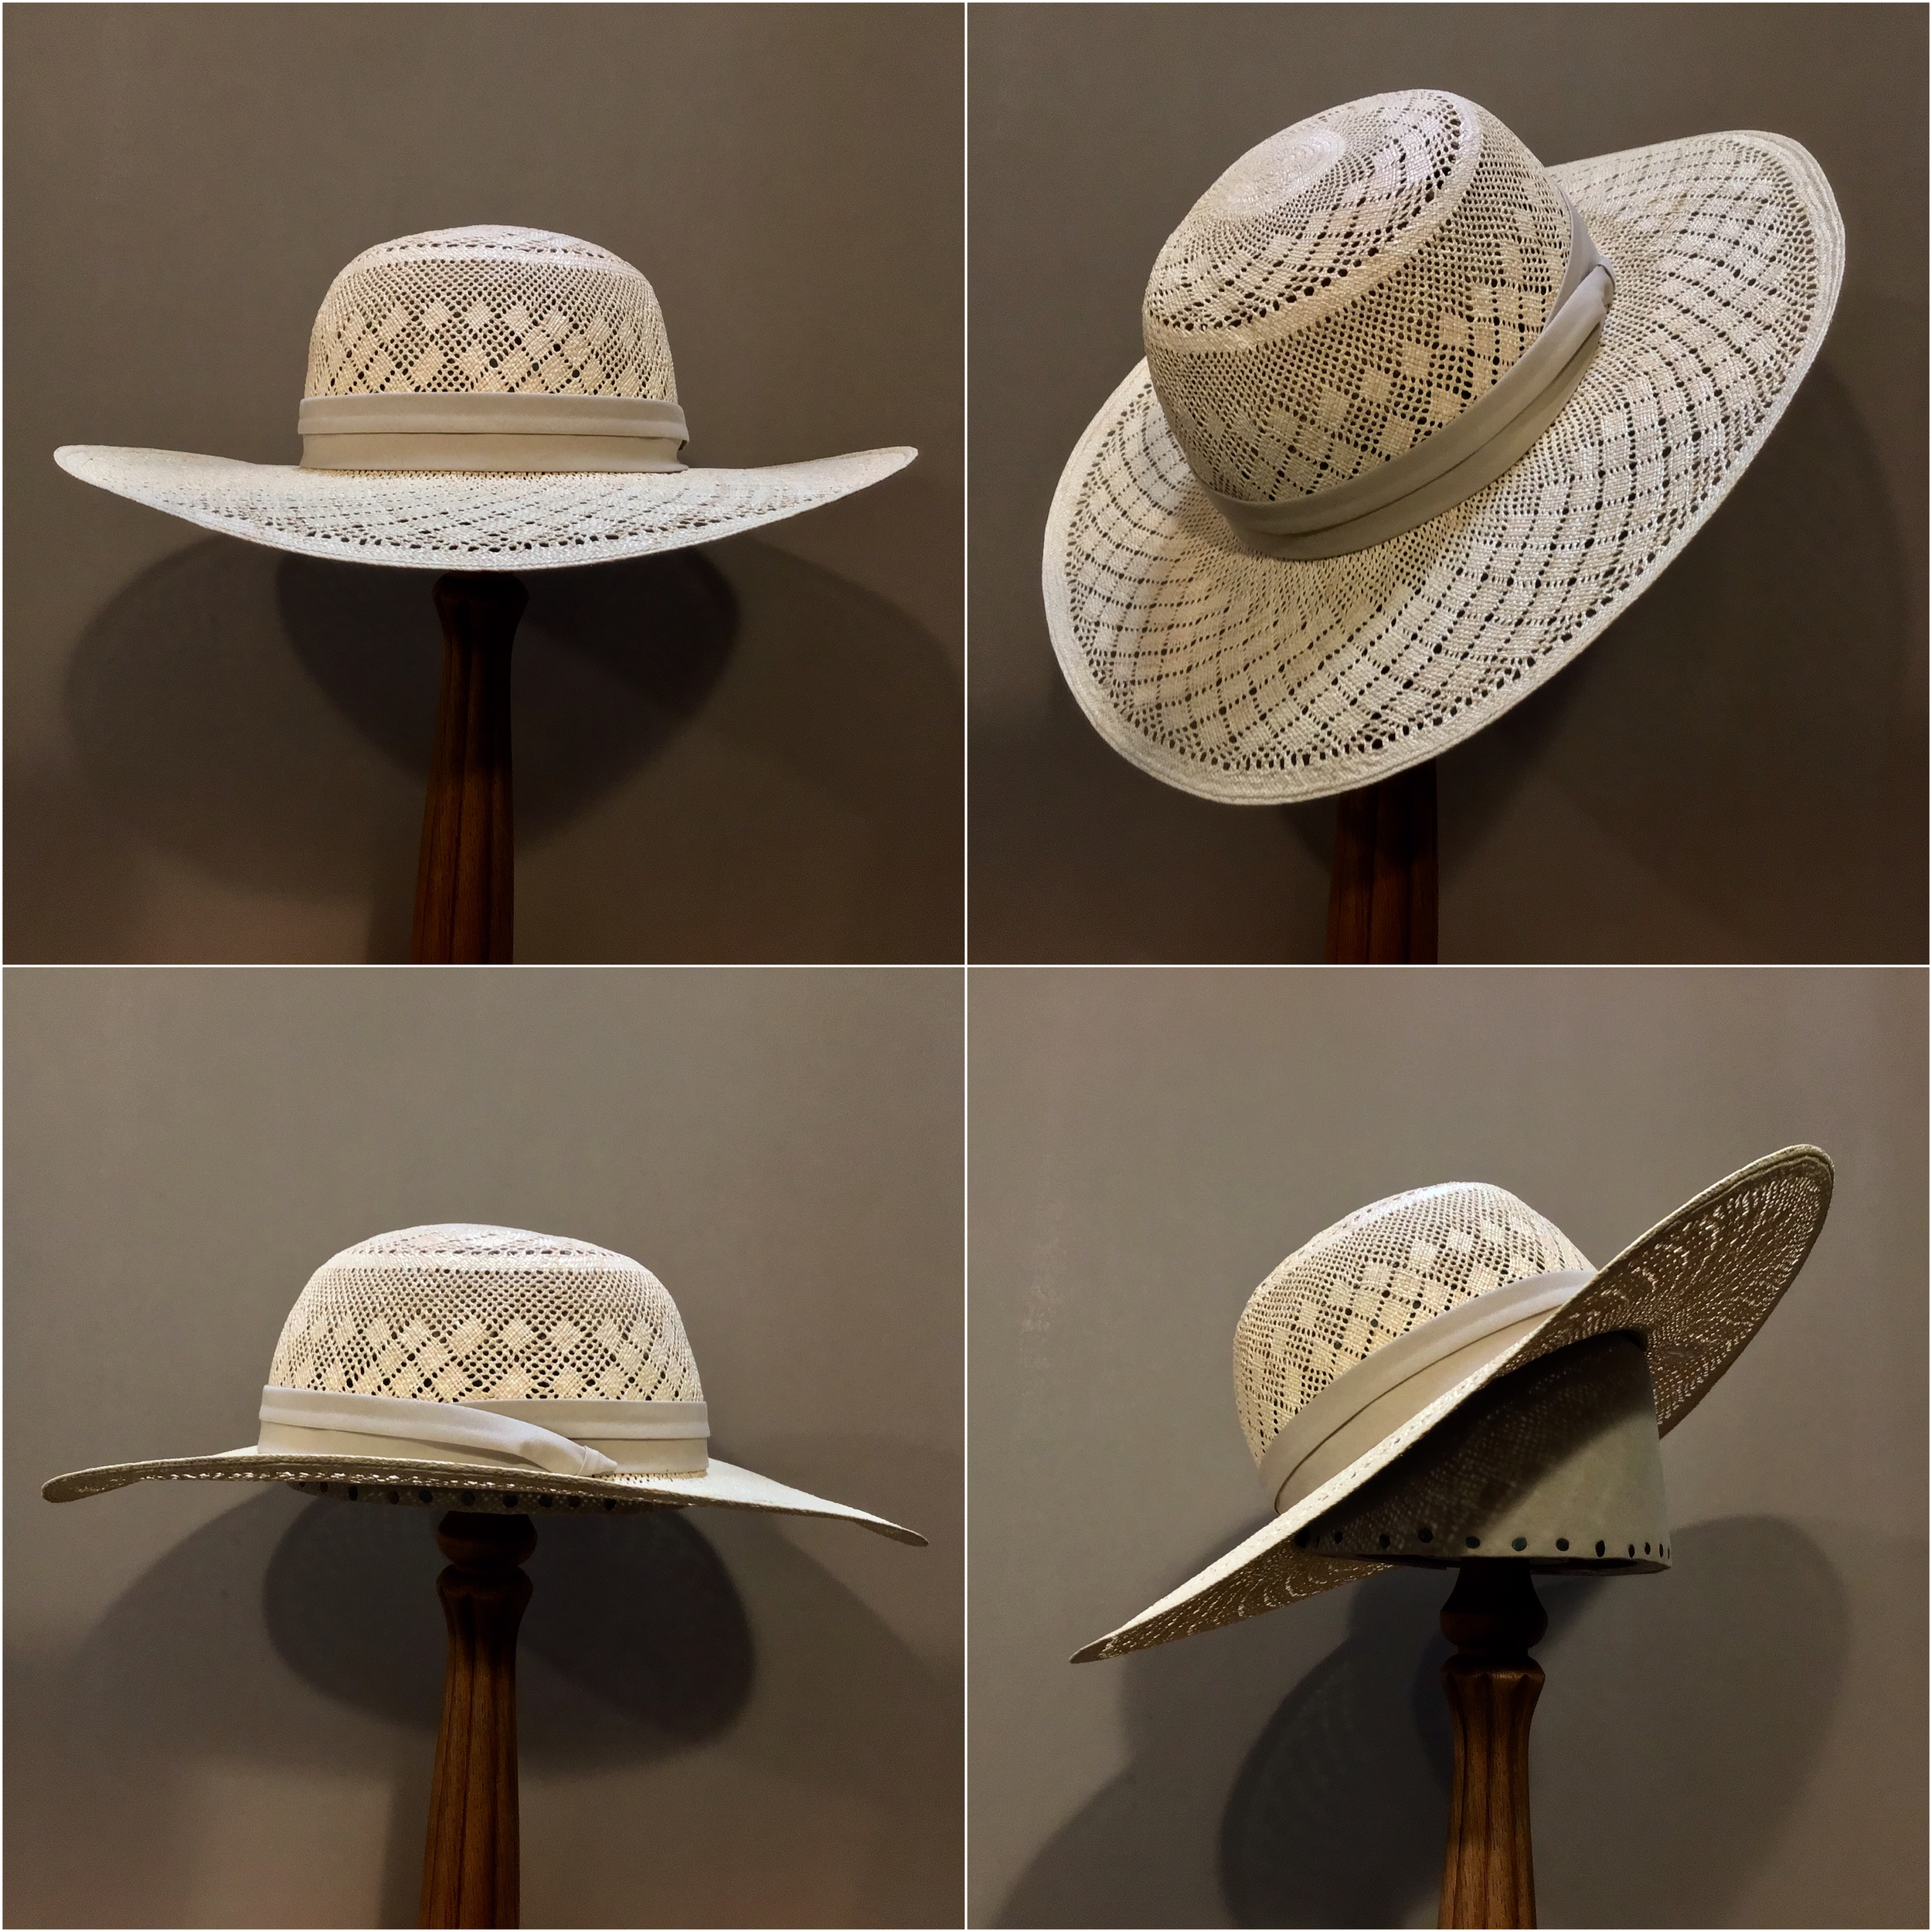 Weave: Plantilla colado Grade: 10 Open Block: Pledge Brim Set/ Width: San Ann/ 3 3/4 inches Trim: Cotton puggaree